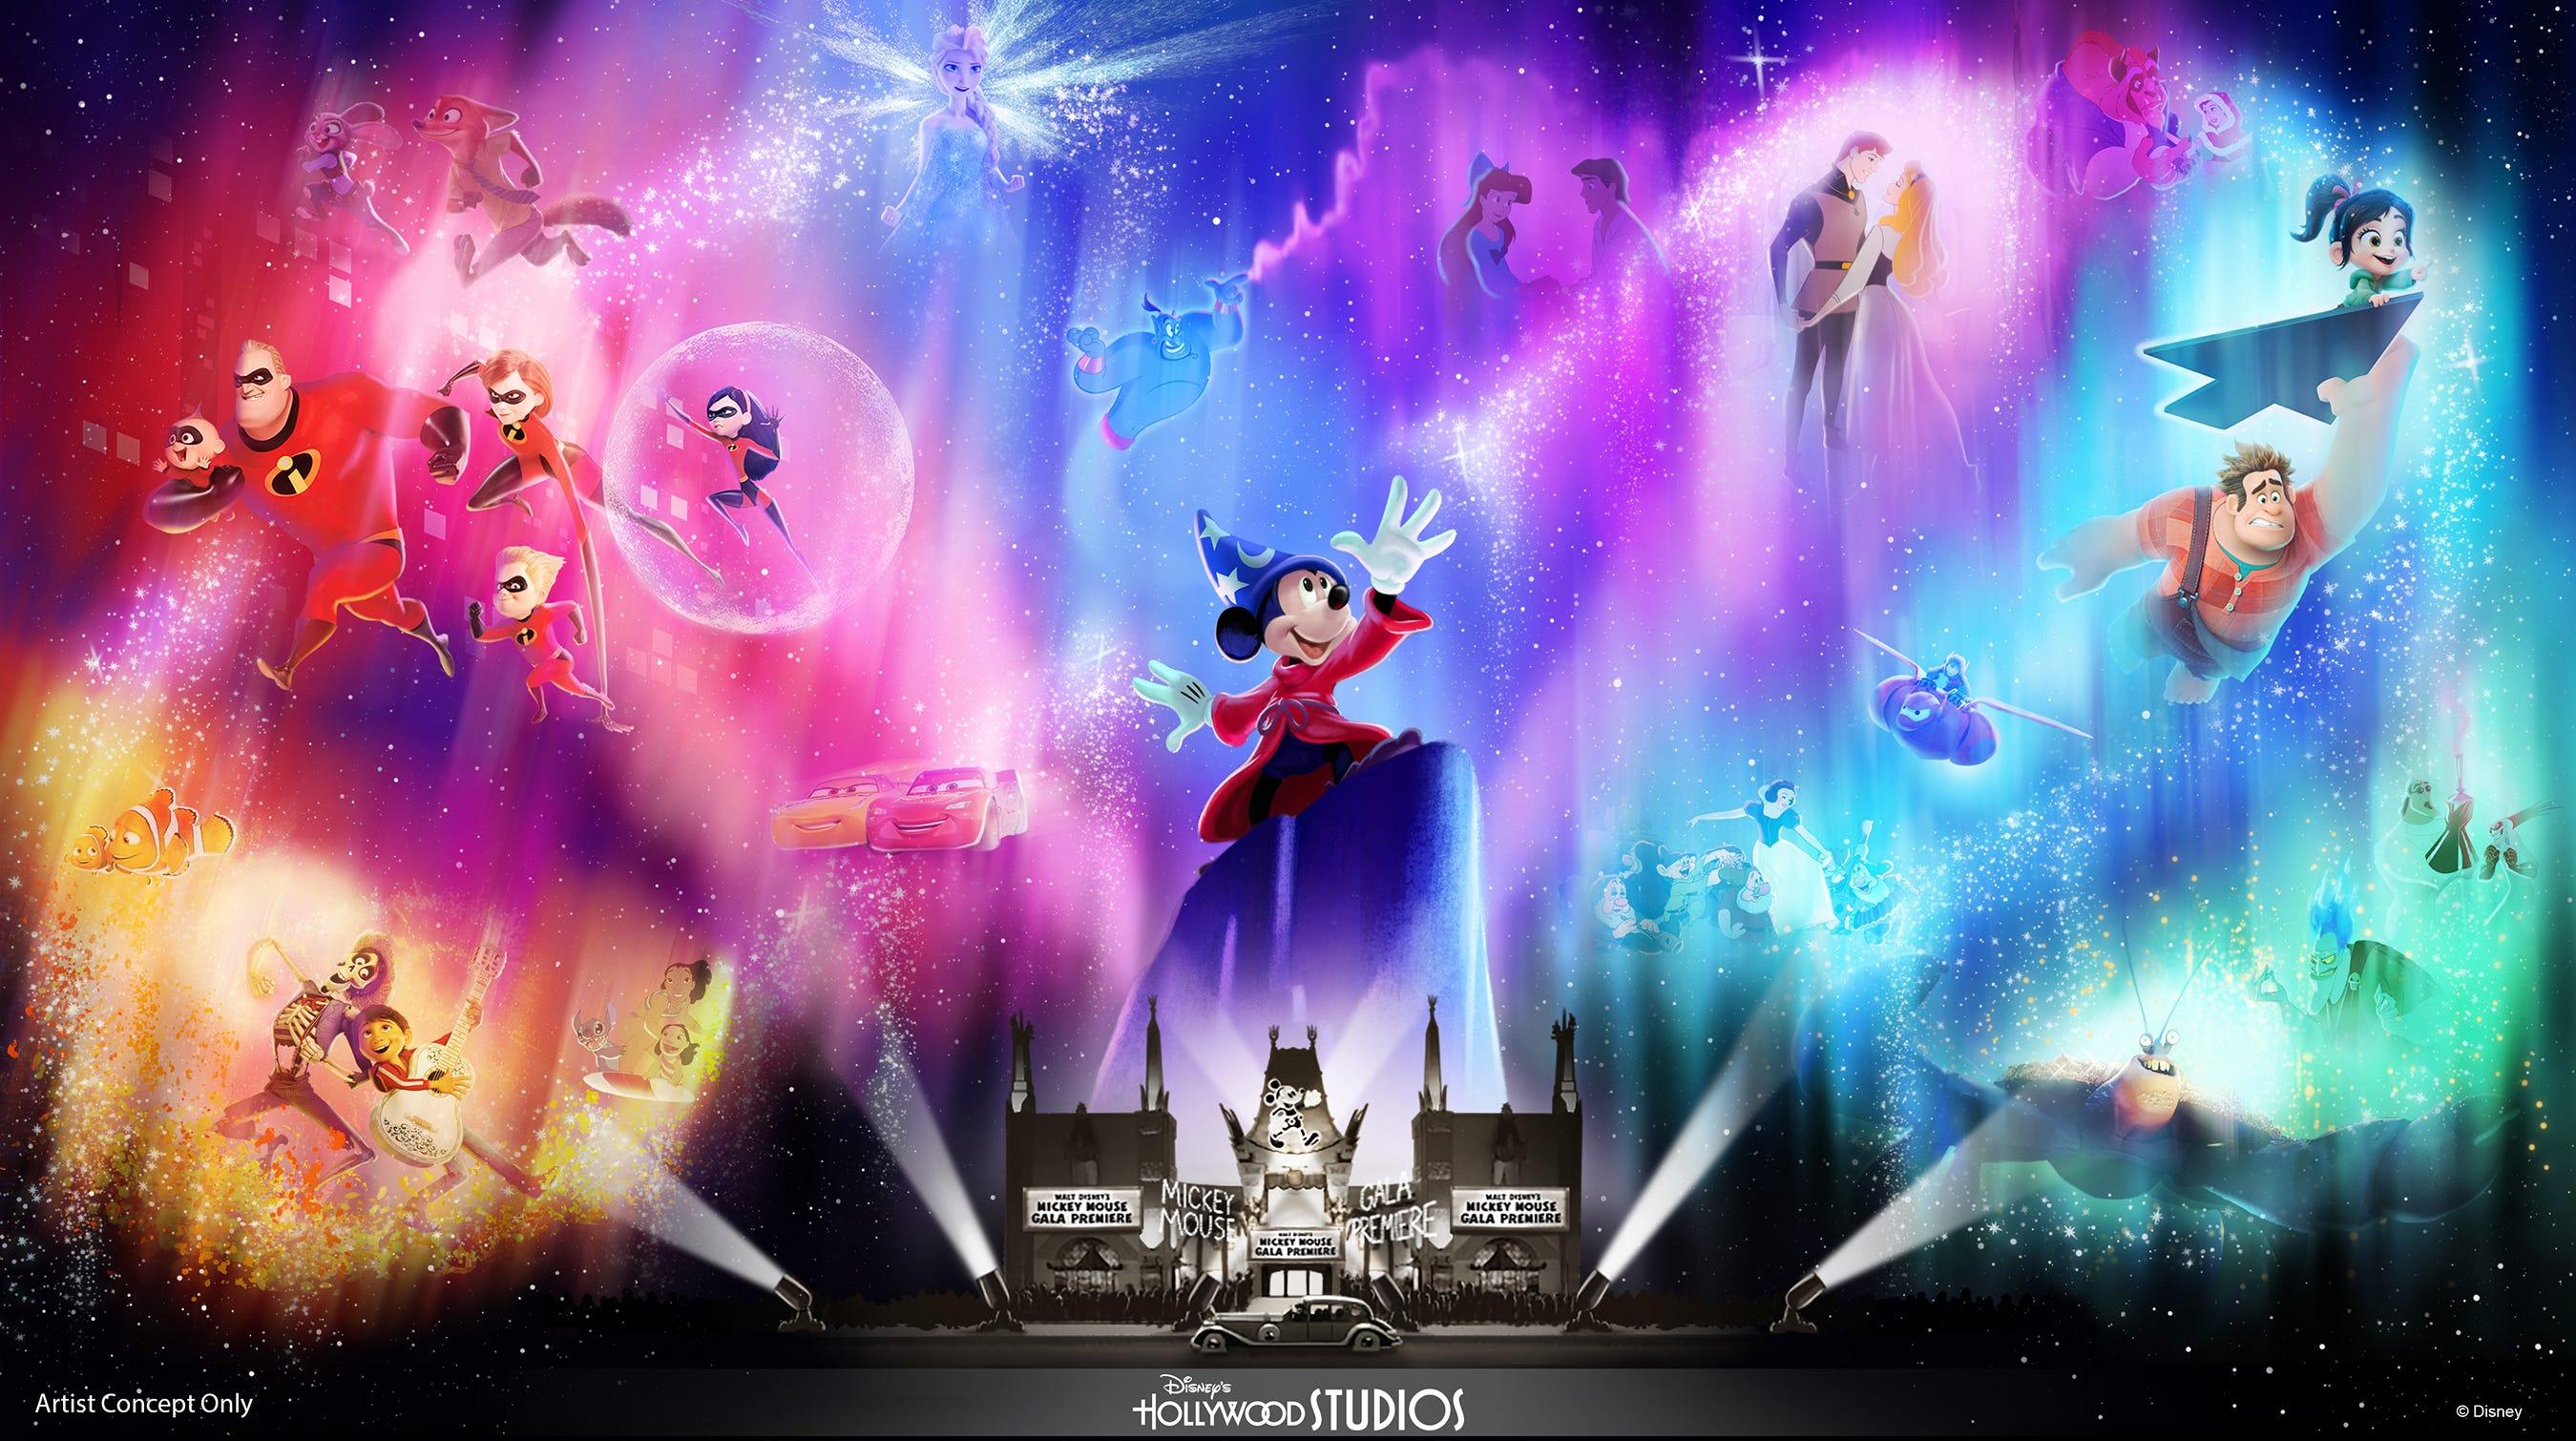 Wonderful World of Animation – a new nighttime...